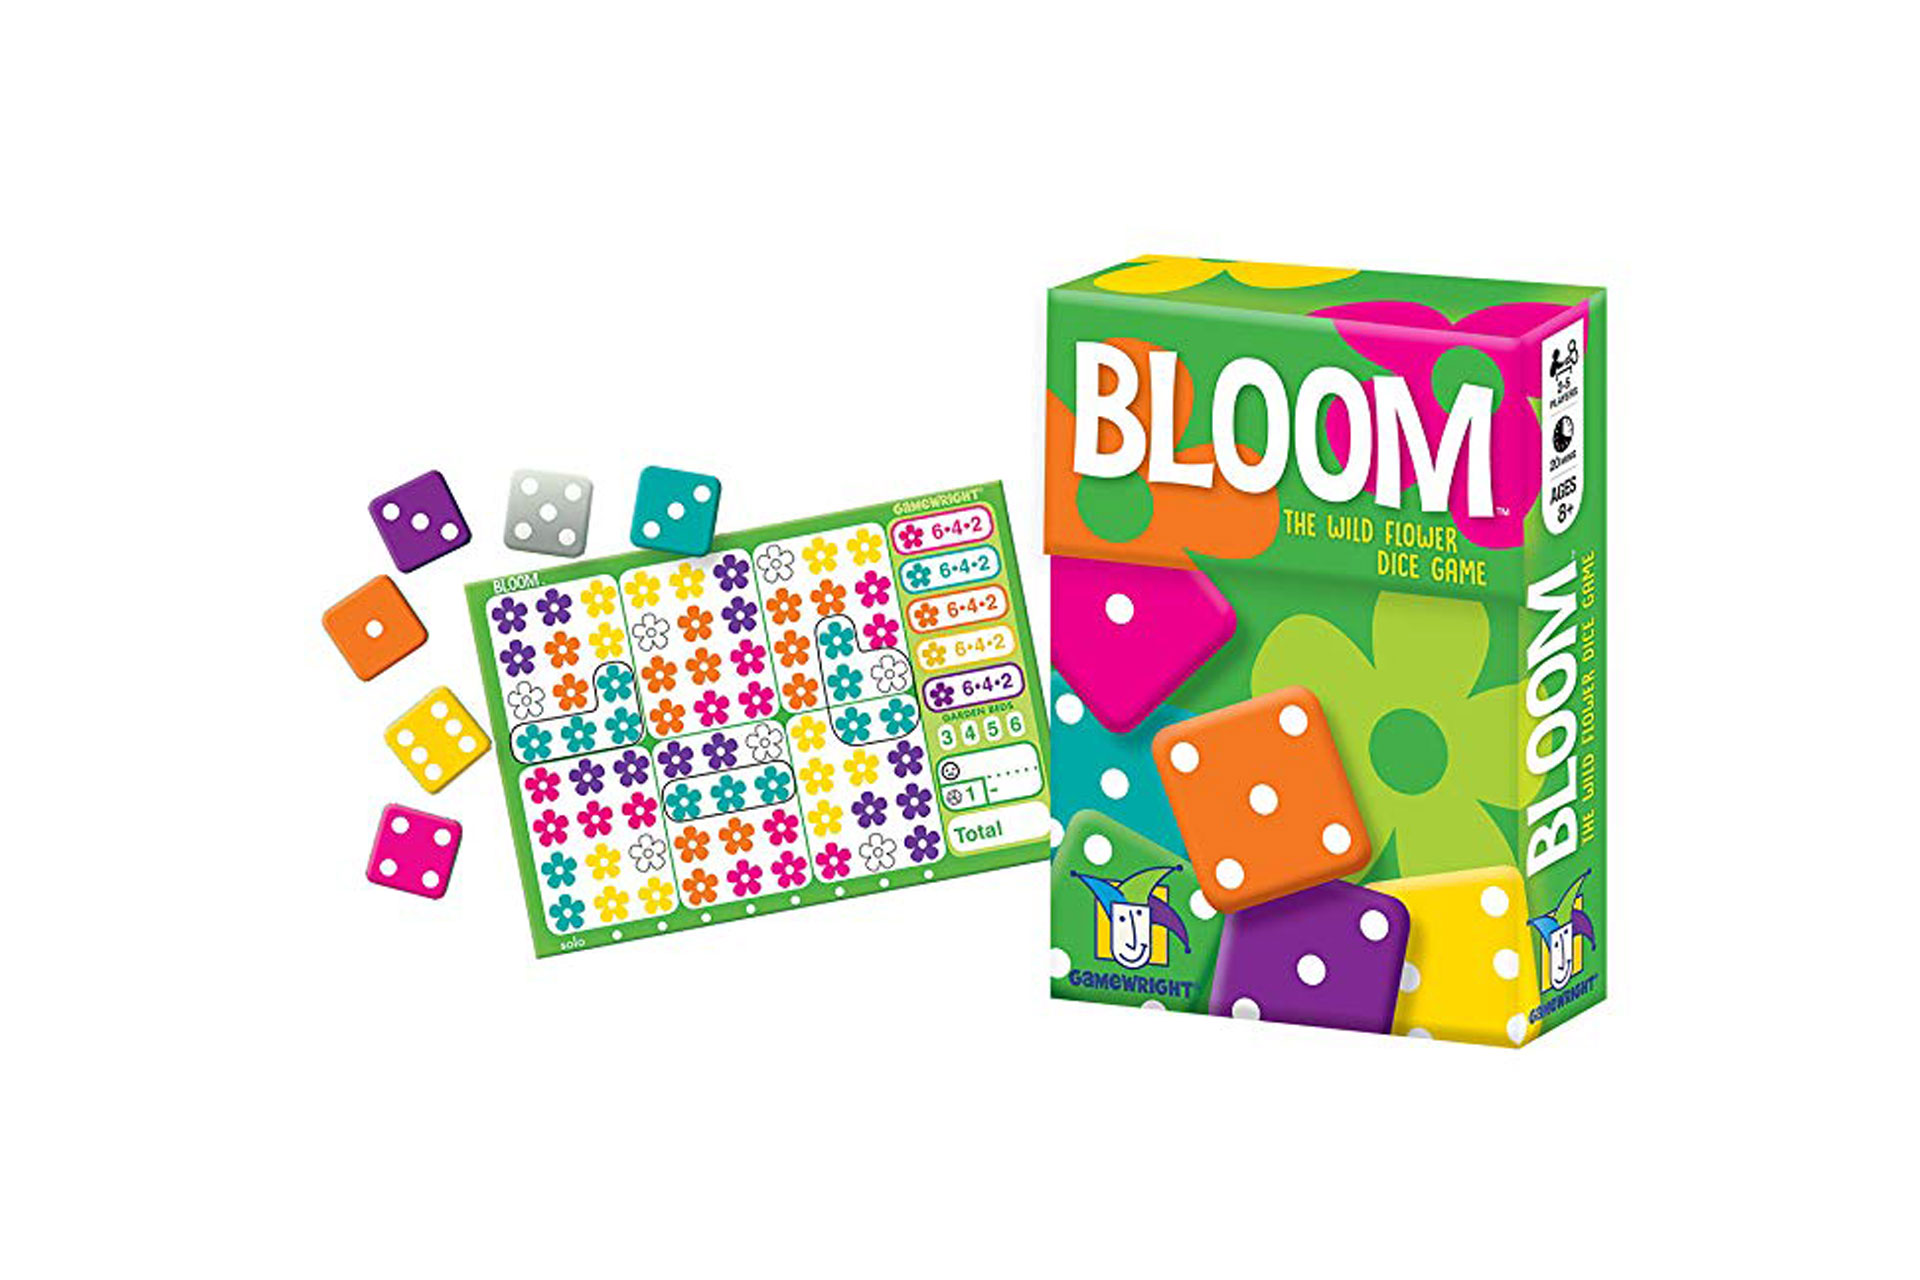 Bloom Travel Game; Courtesy of Amazon